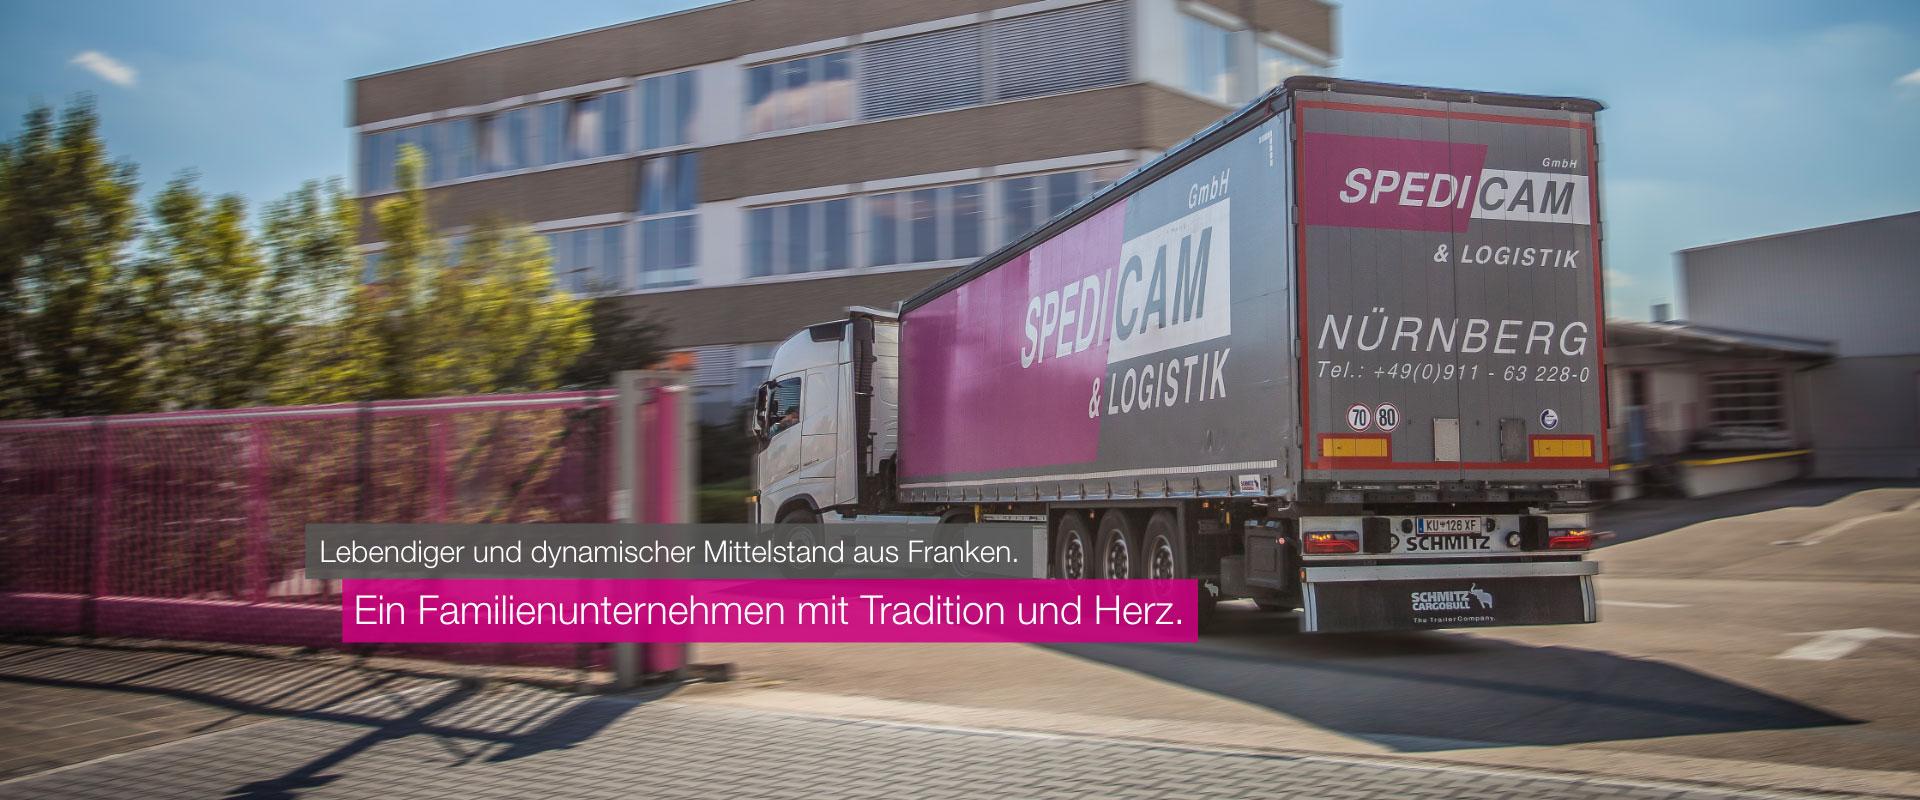 Unternehmen SPEDICAM & LOGISTIK